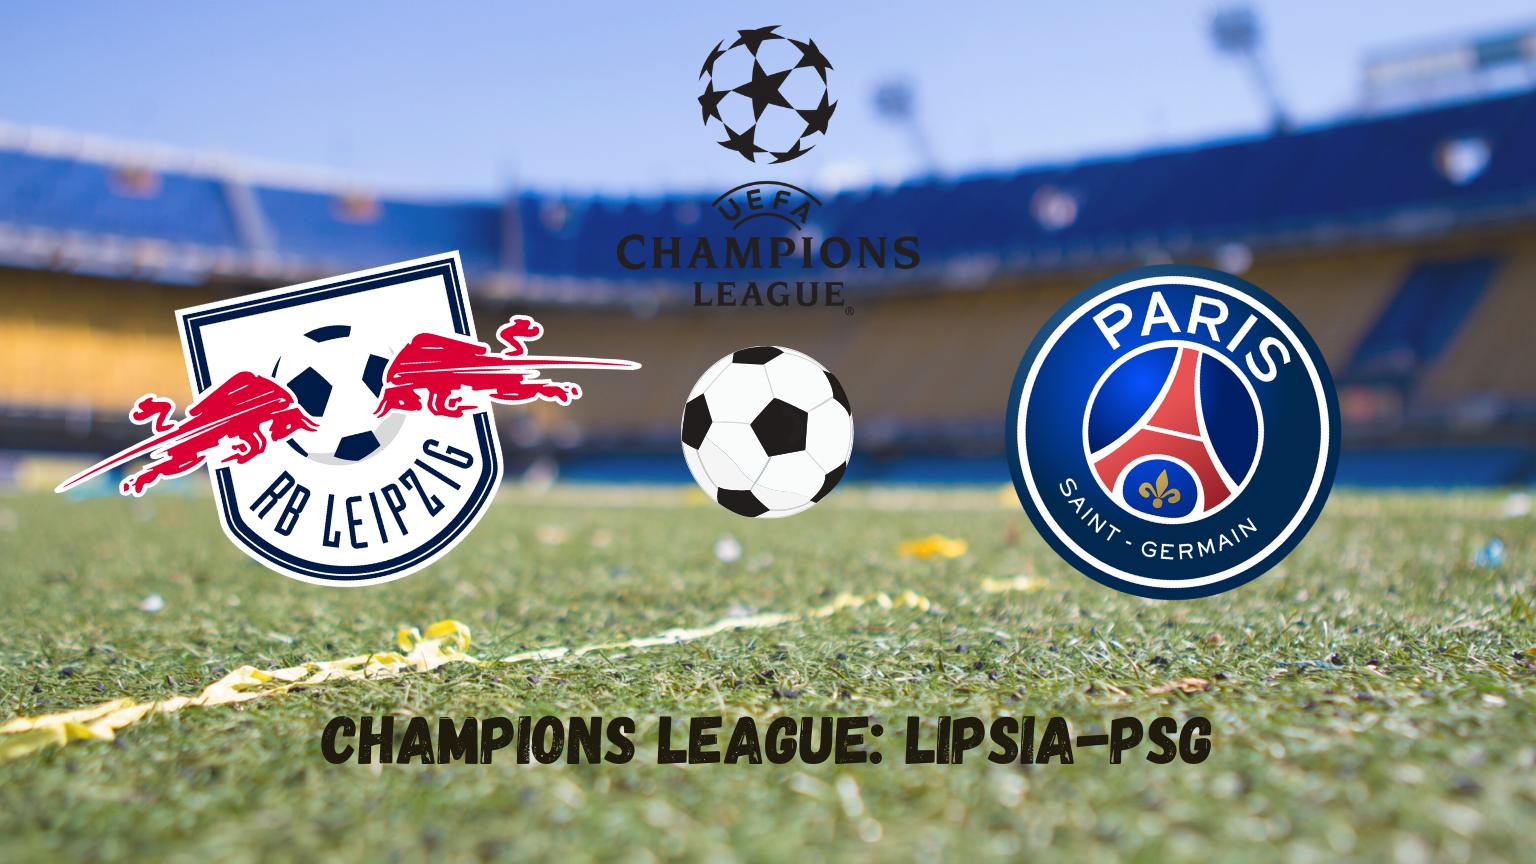 Pronostici Champions League: Lipsia-PSG